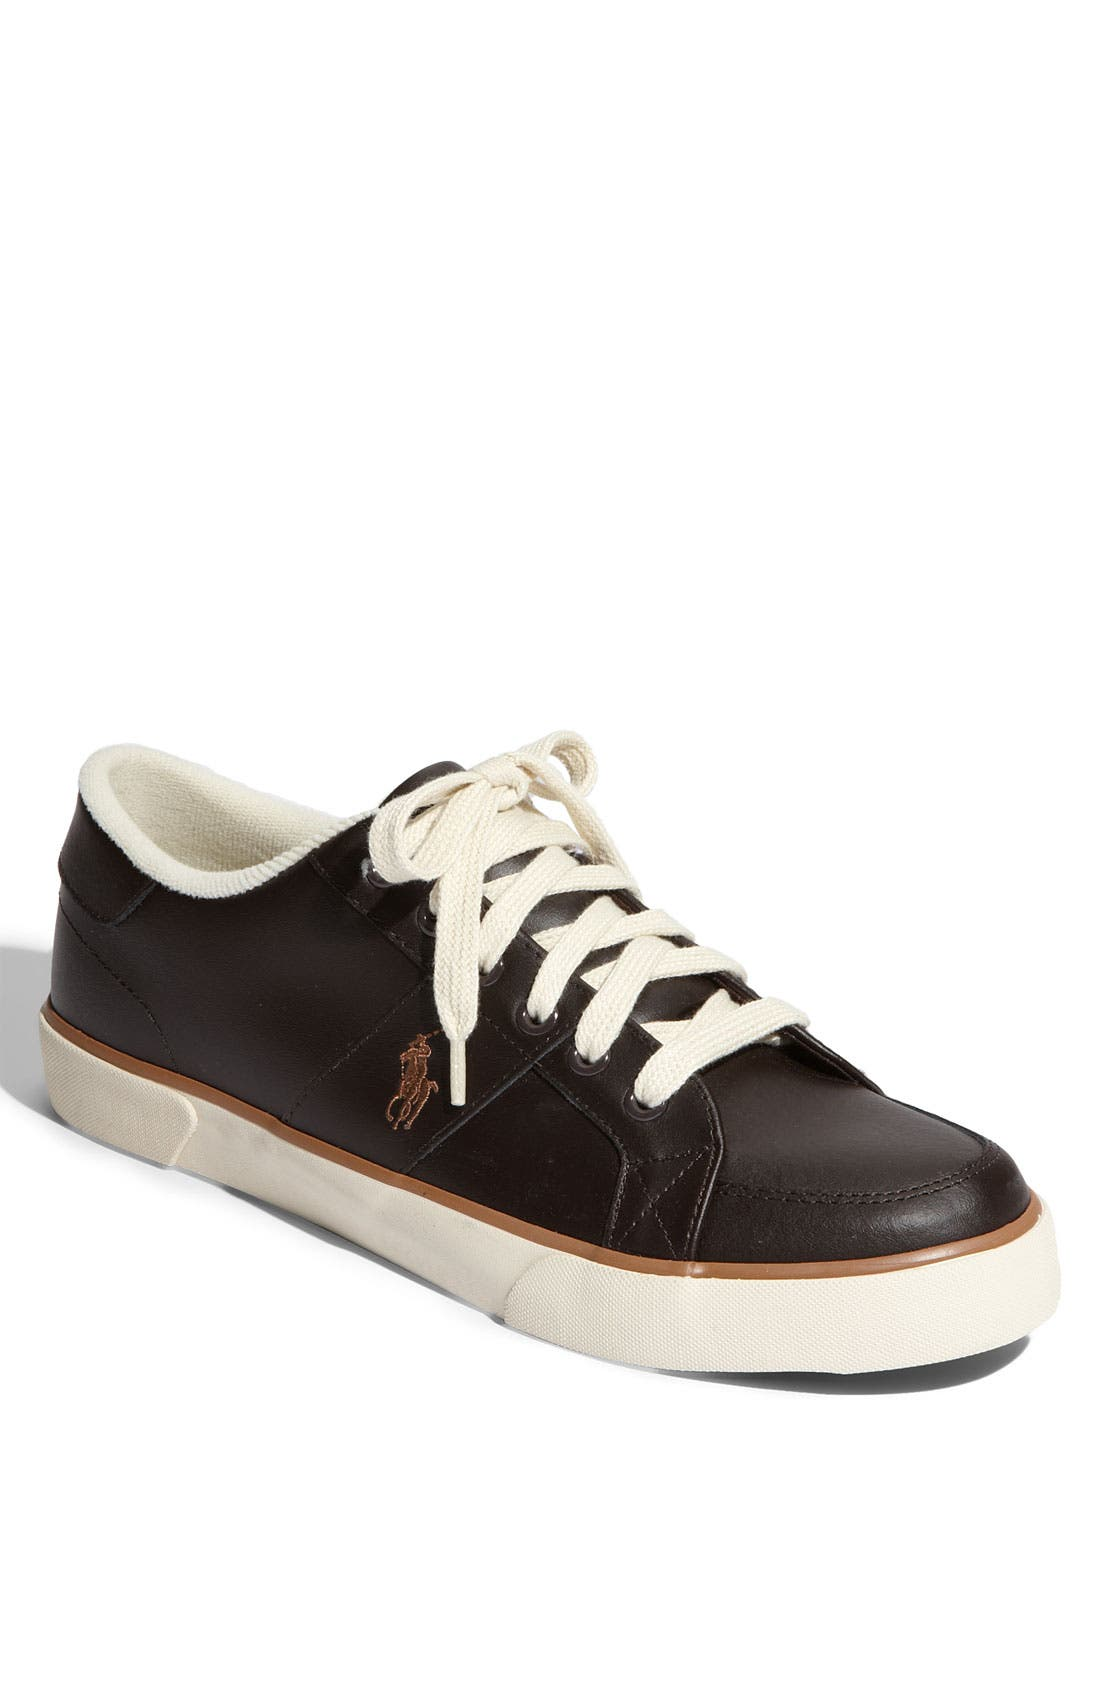 Main Image - Polo Ralph Lauren 'Harold' Sneaker